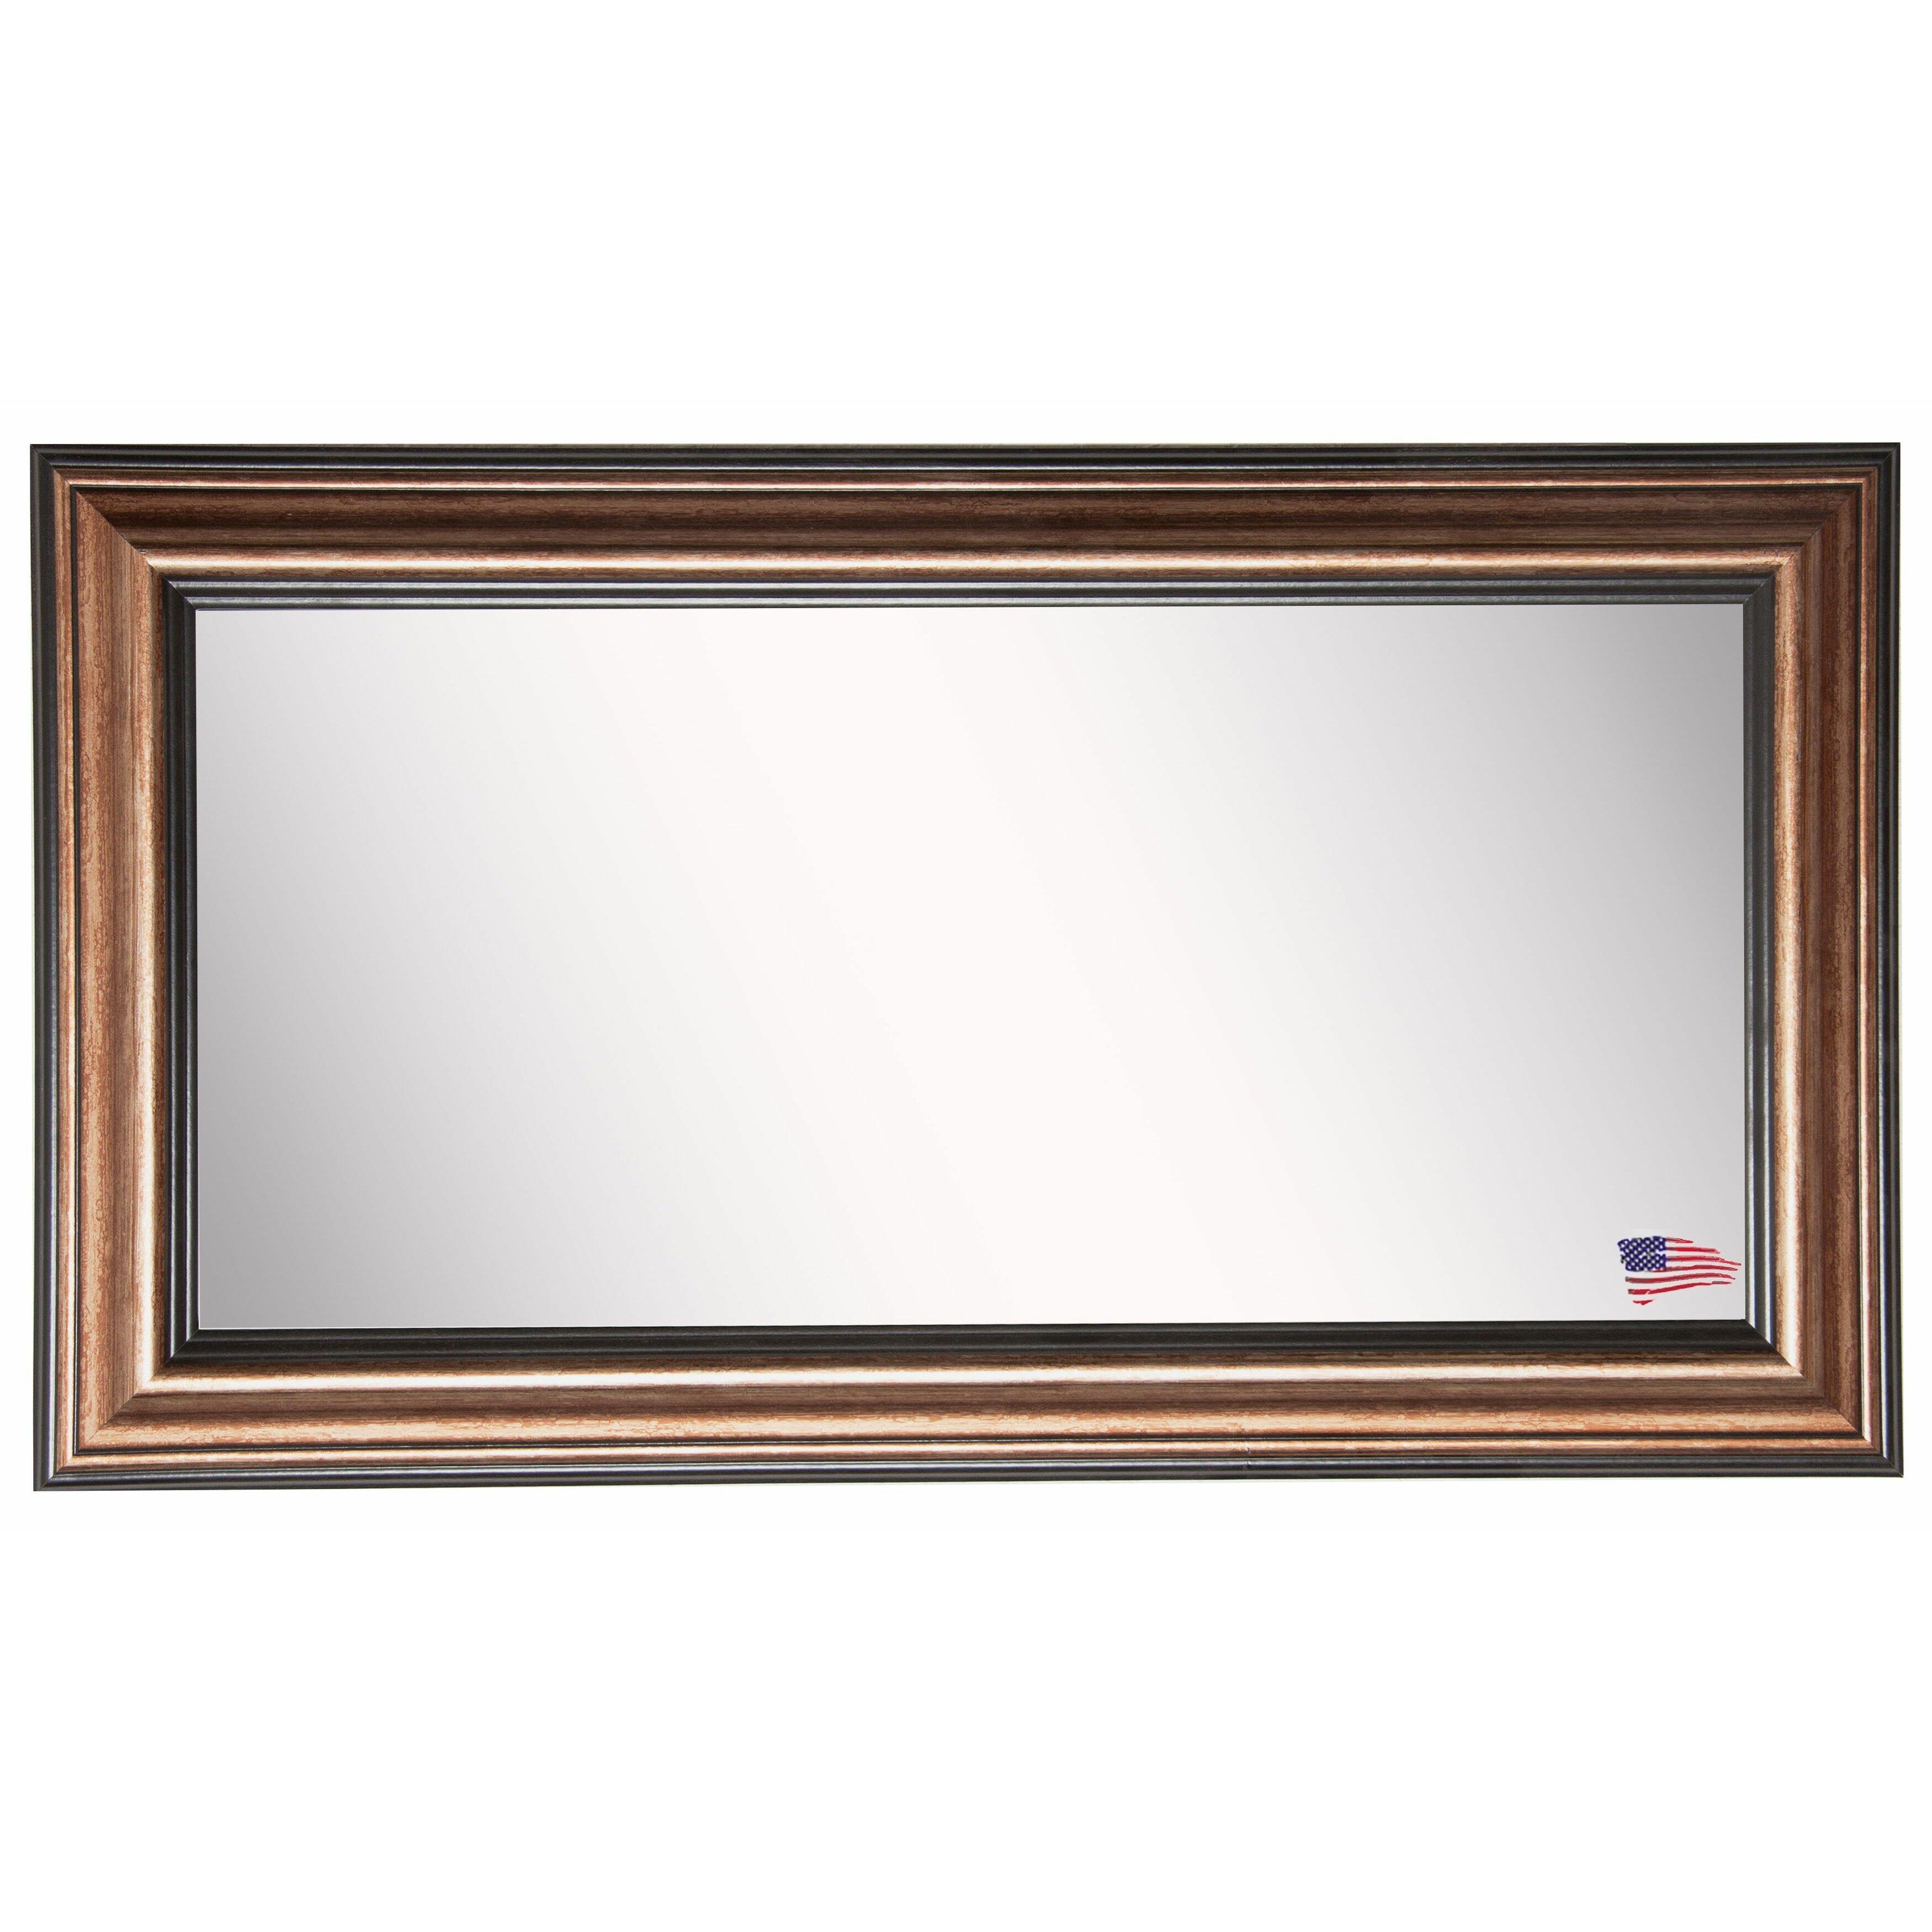 Rayne mirrors canyon double vanity wall mirror amp reviews wayfair